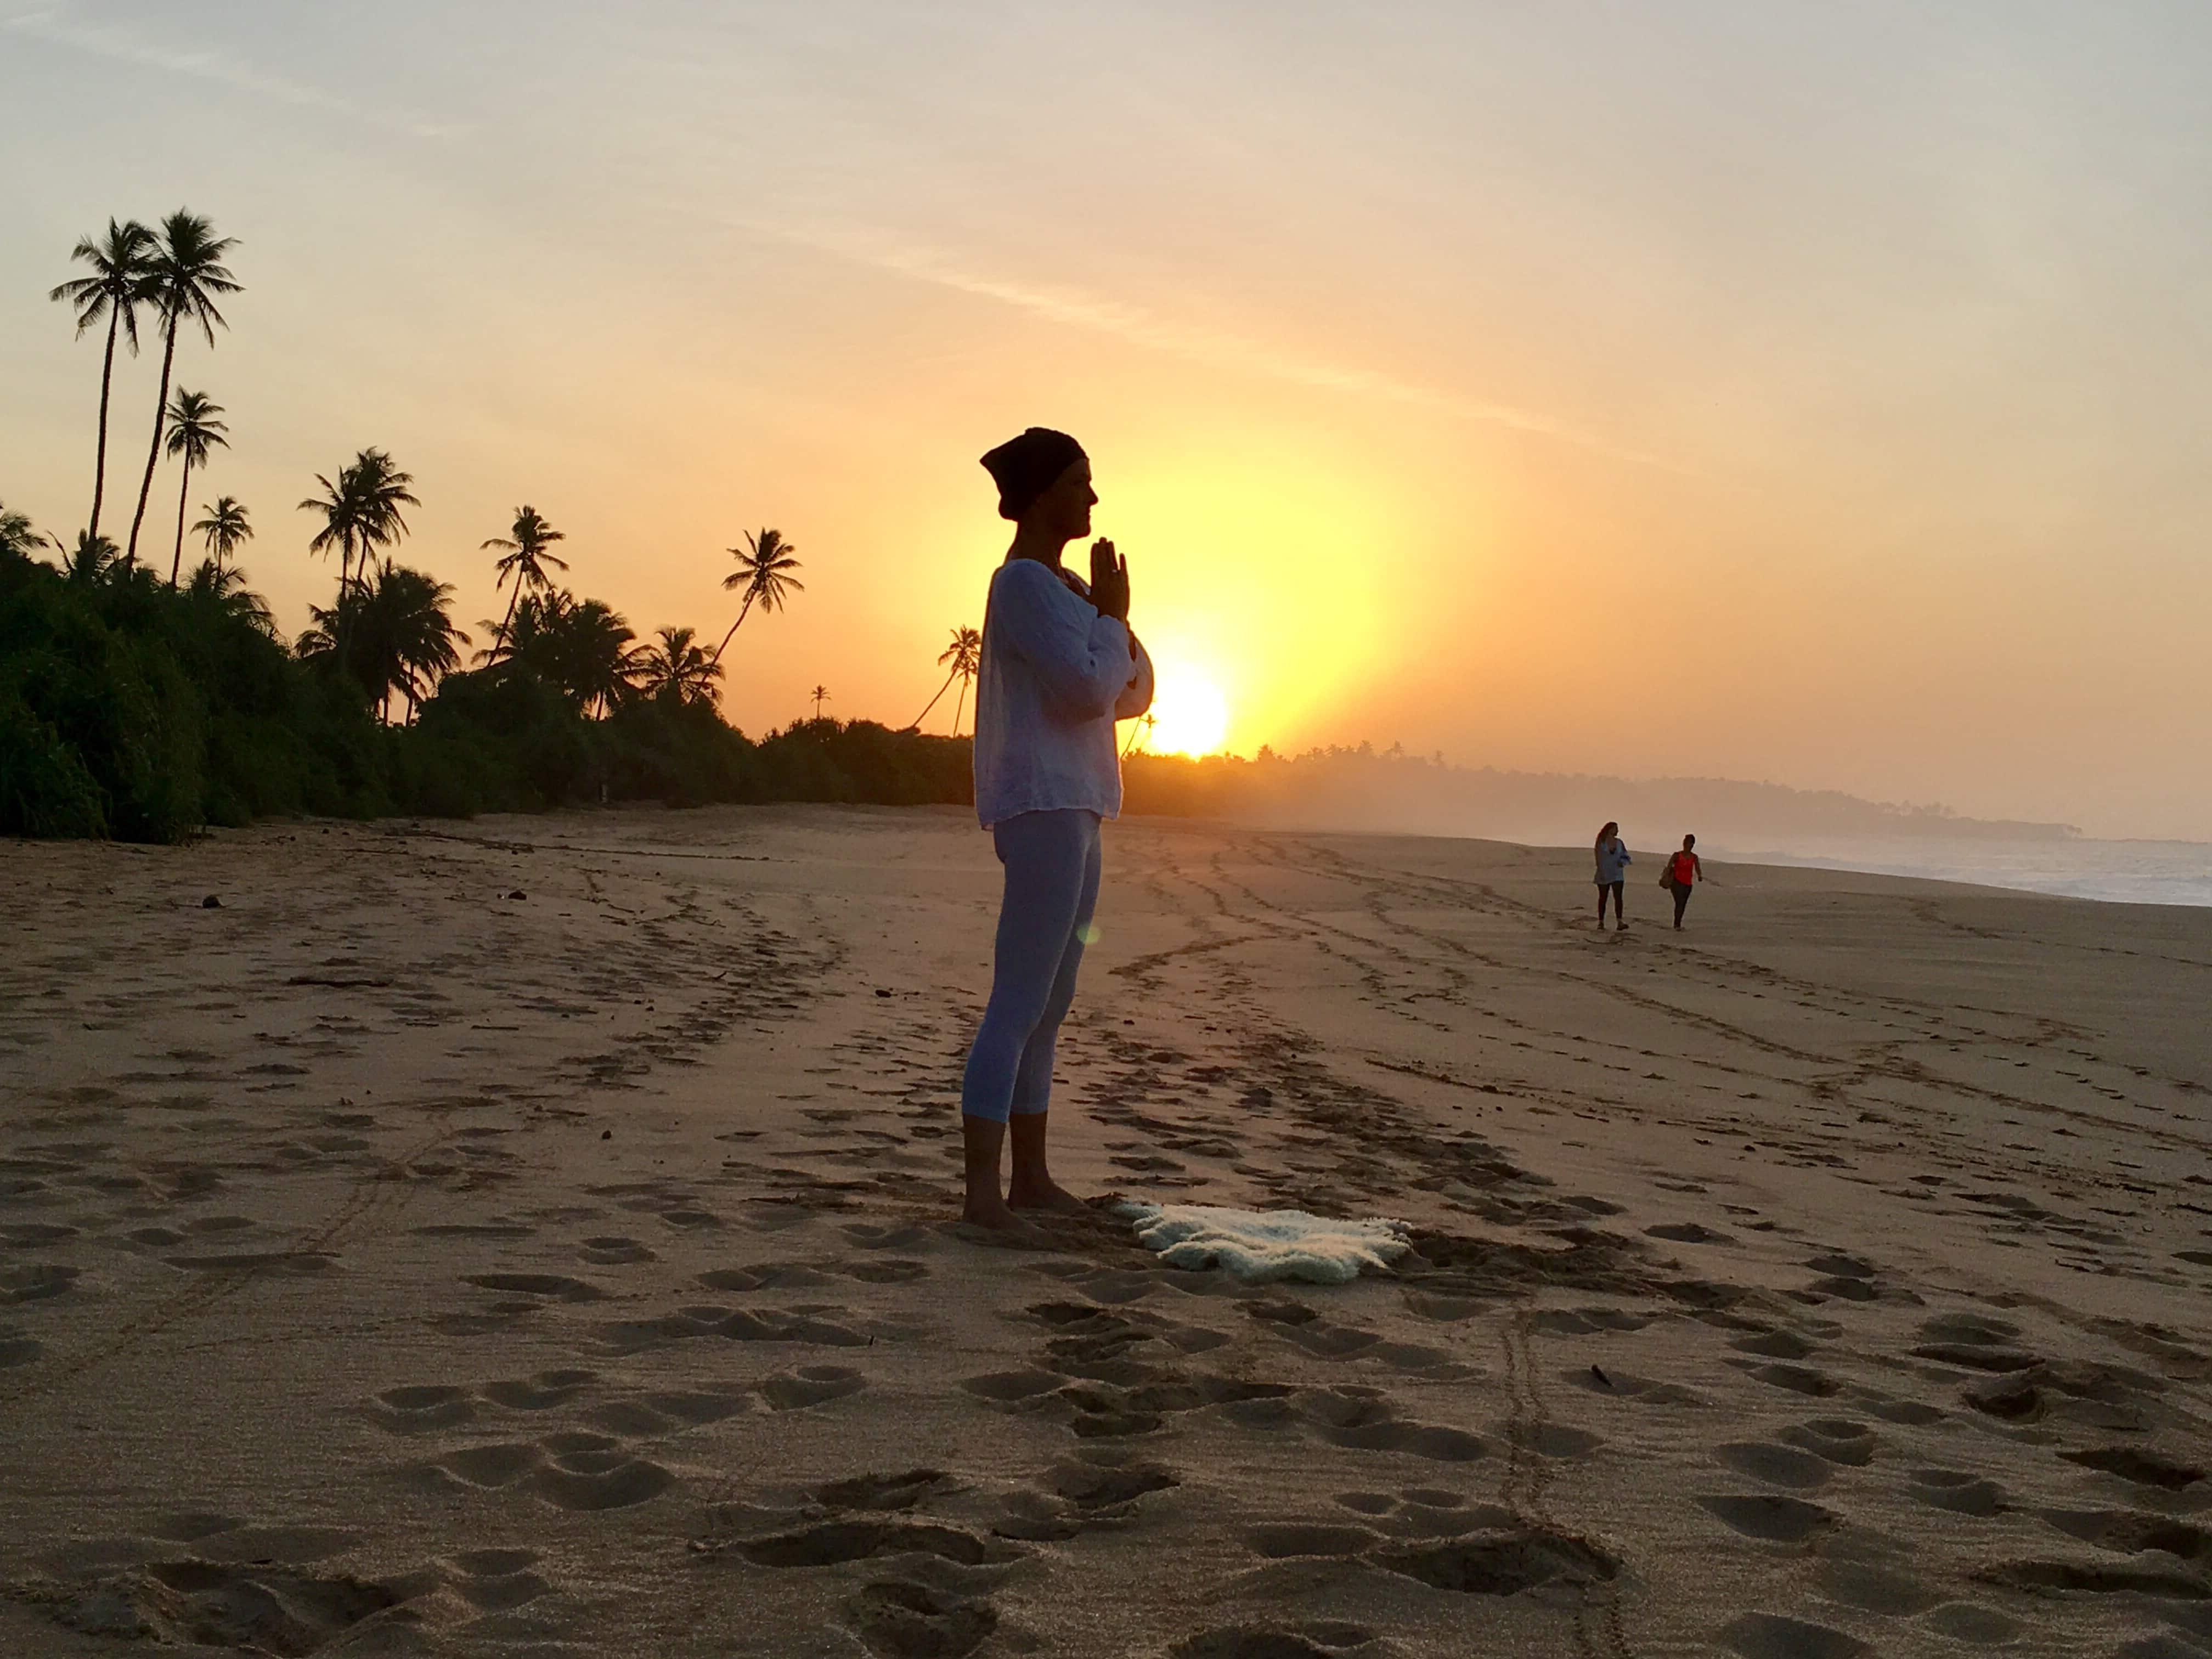 sun and prayer